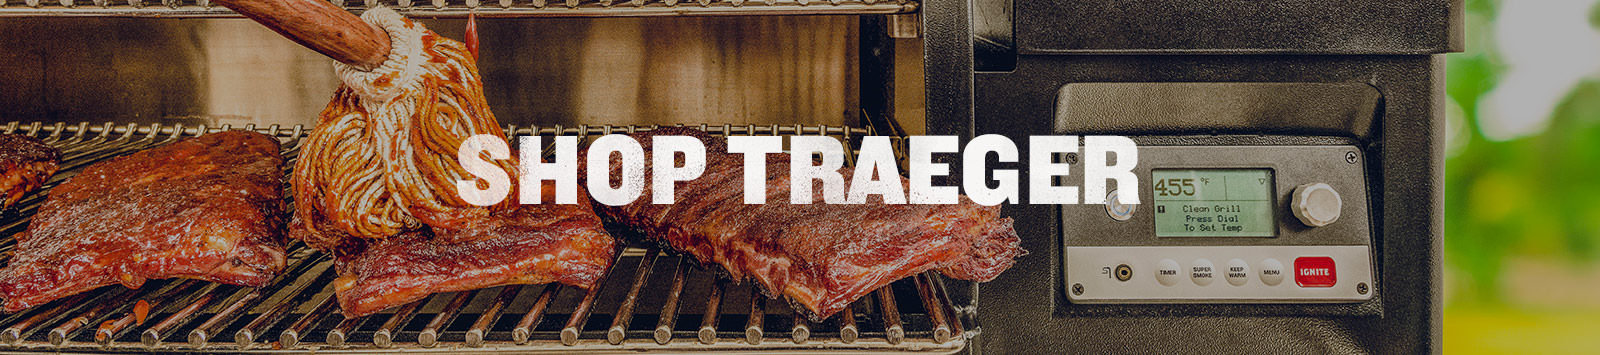 shop-traeger-grills.jpg